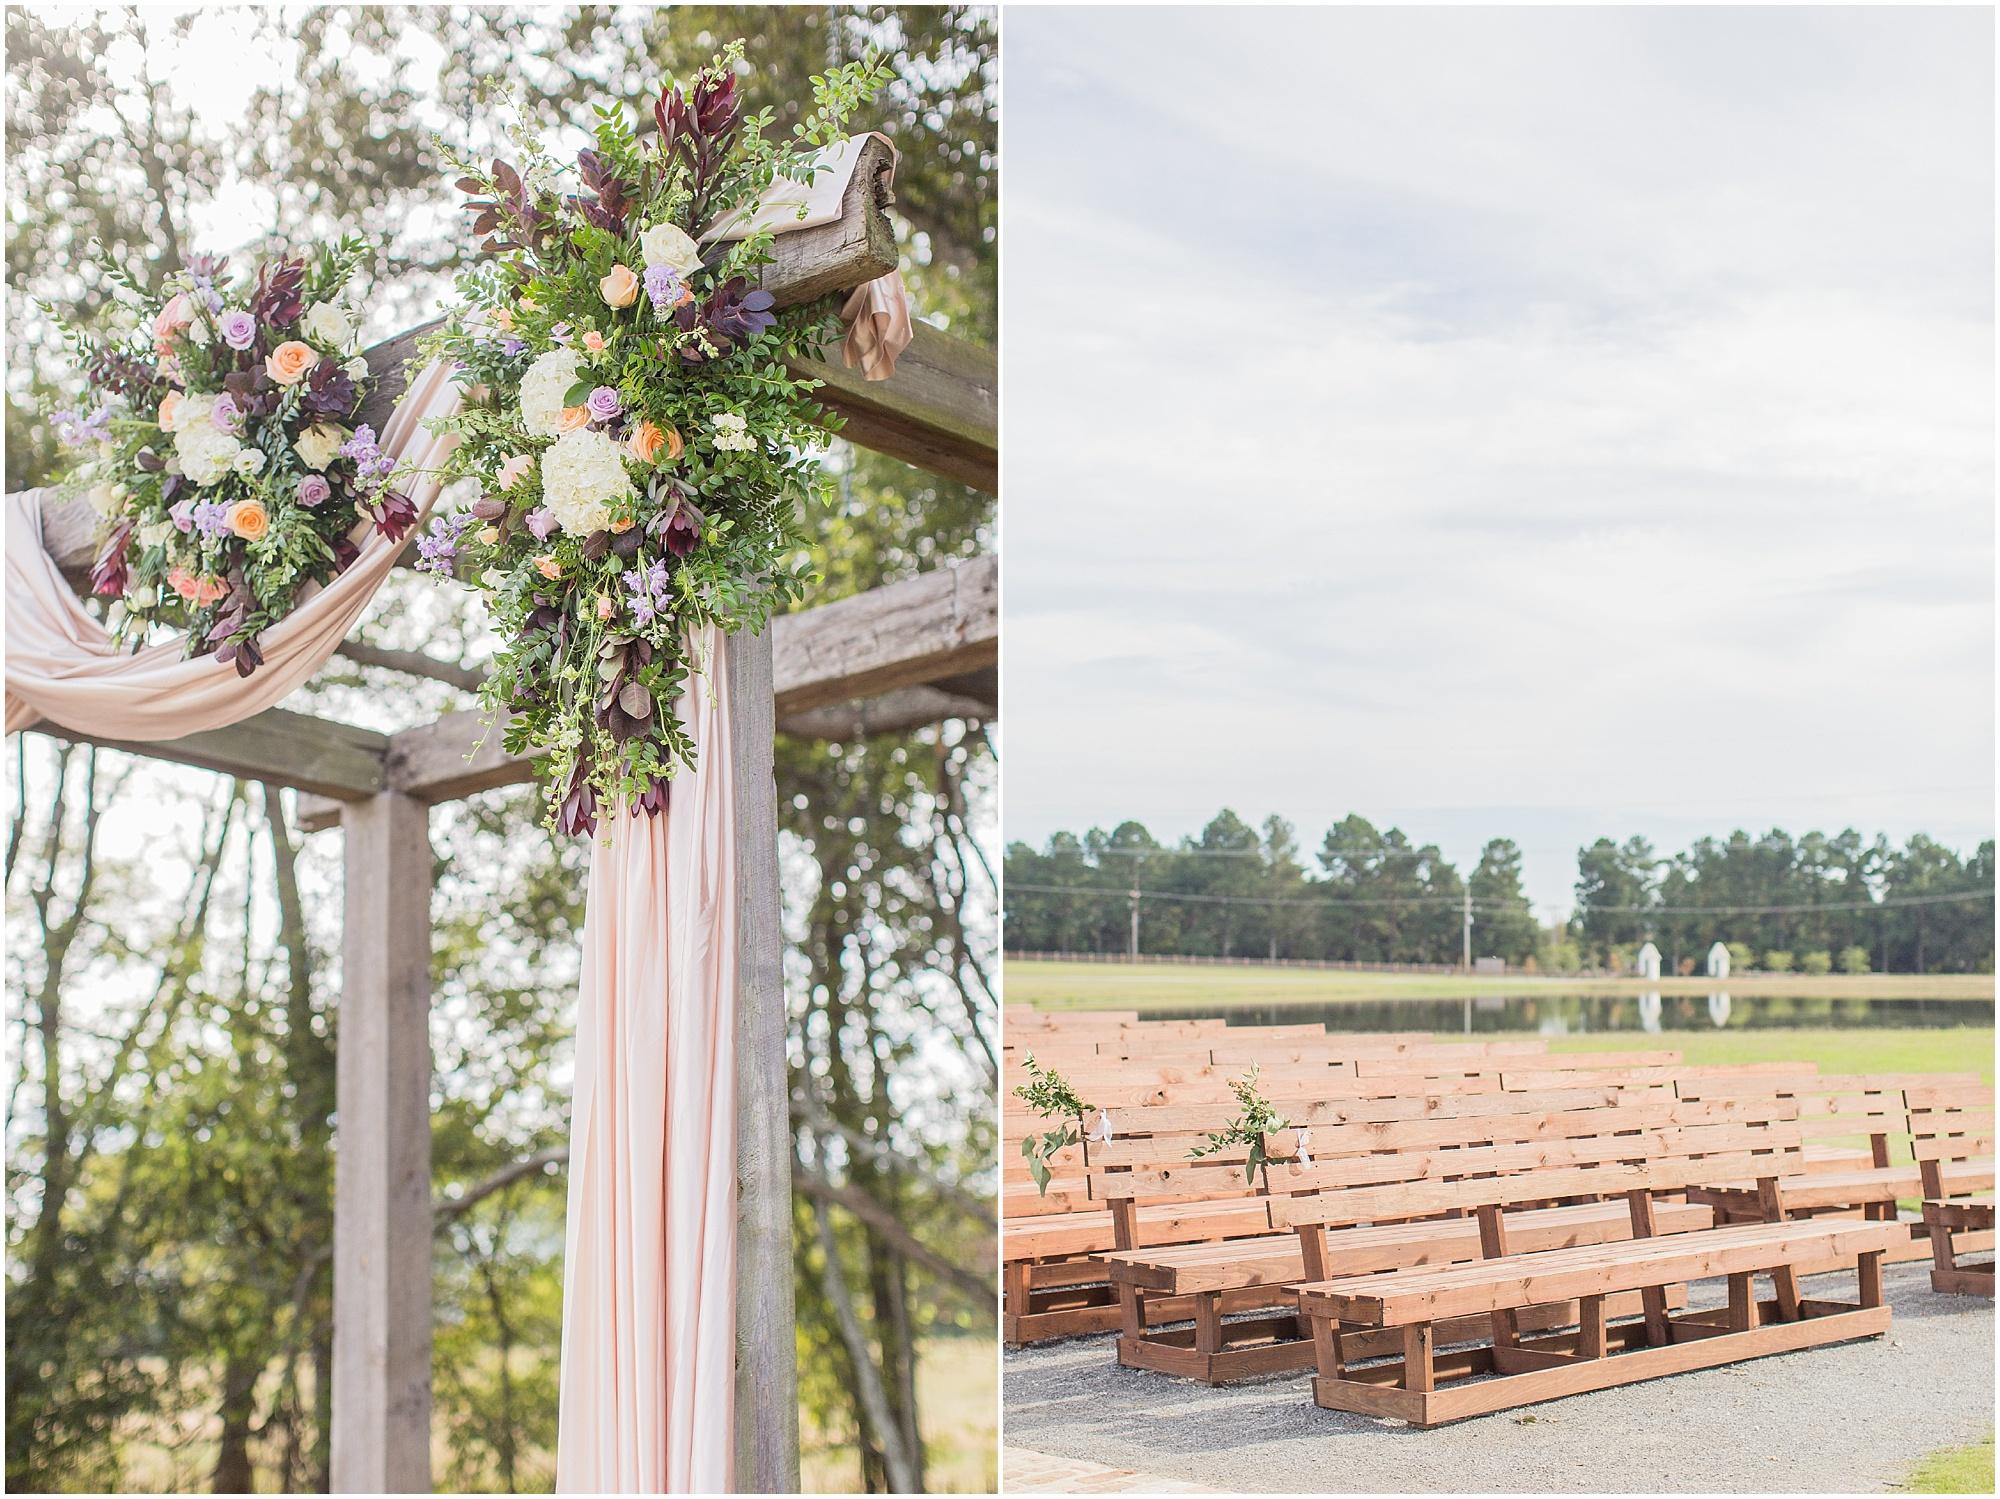 fall-wedding-bridlewood-of-madison-mississippi_0044.jpg